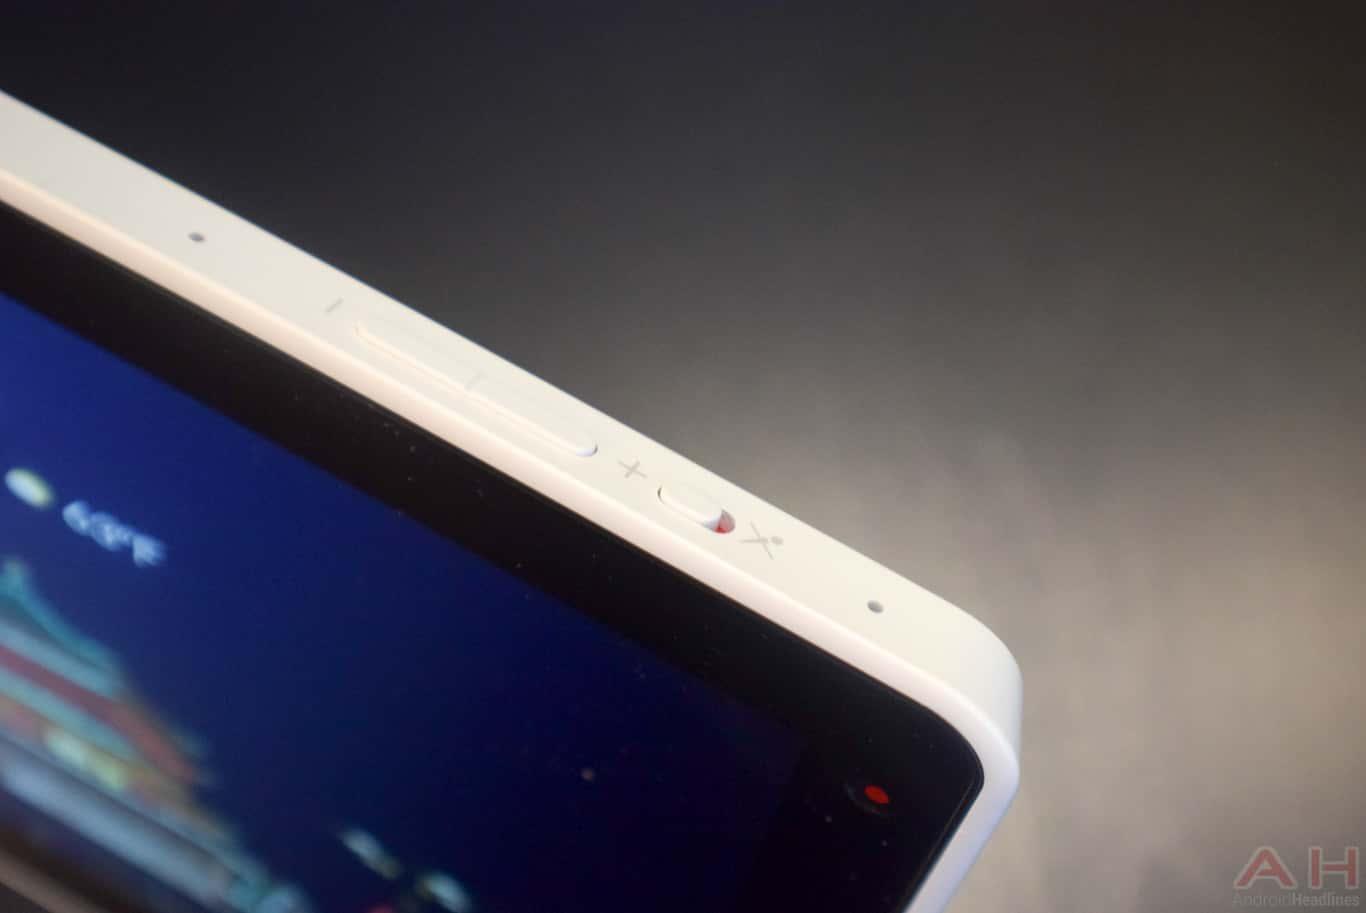 Lenovo Smart Display CES 2018 AM AH 0060